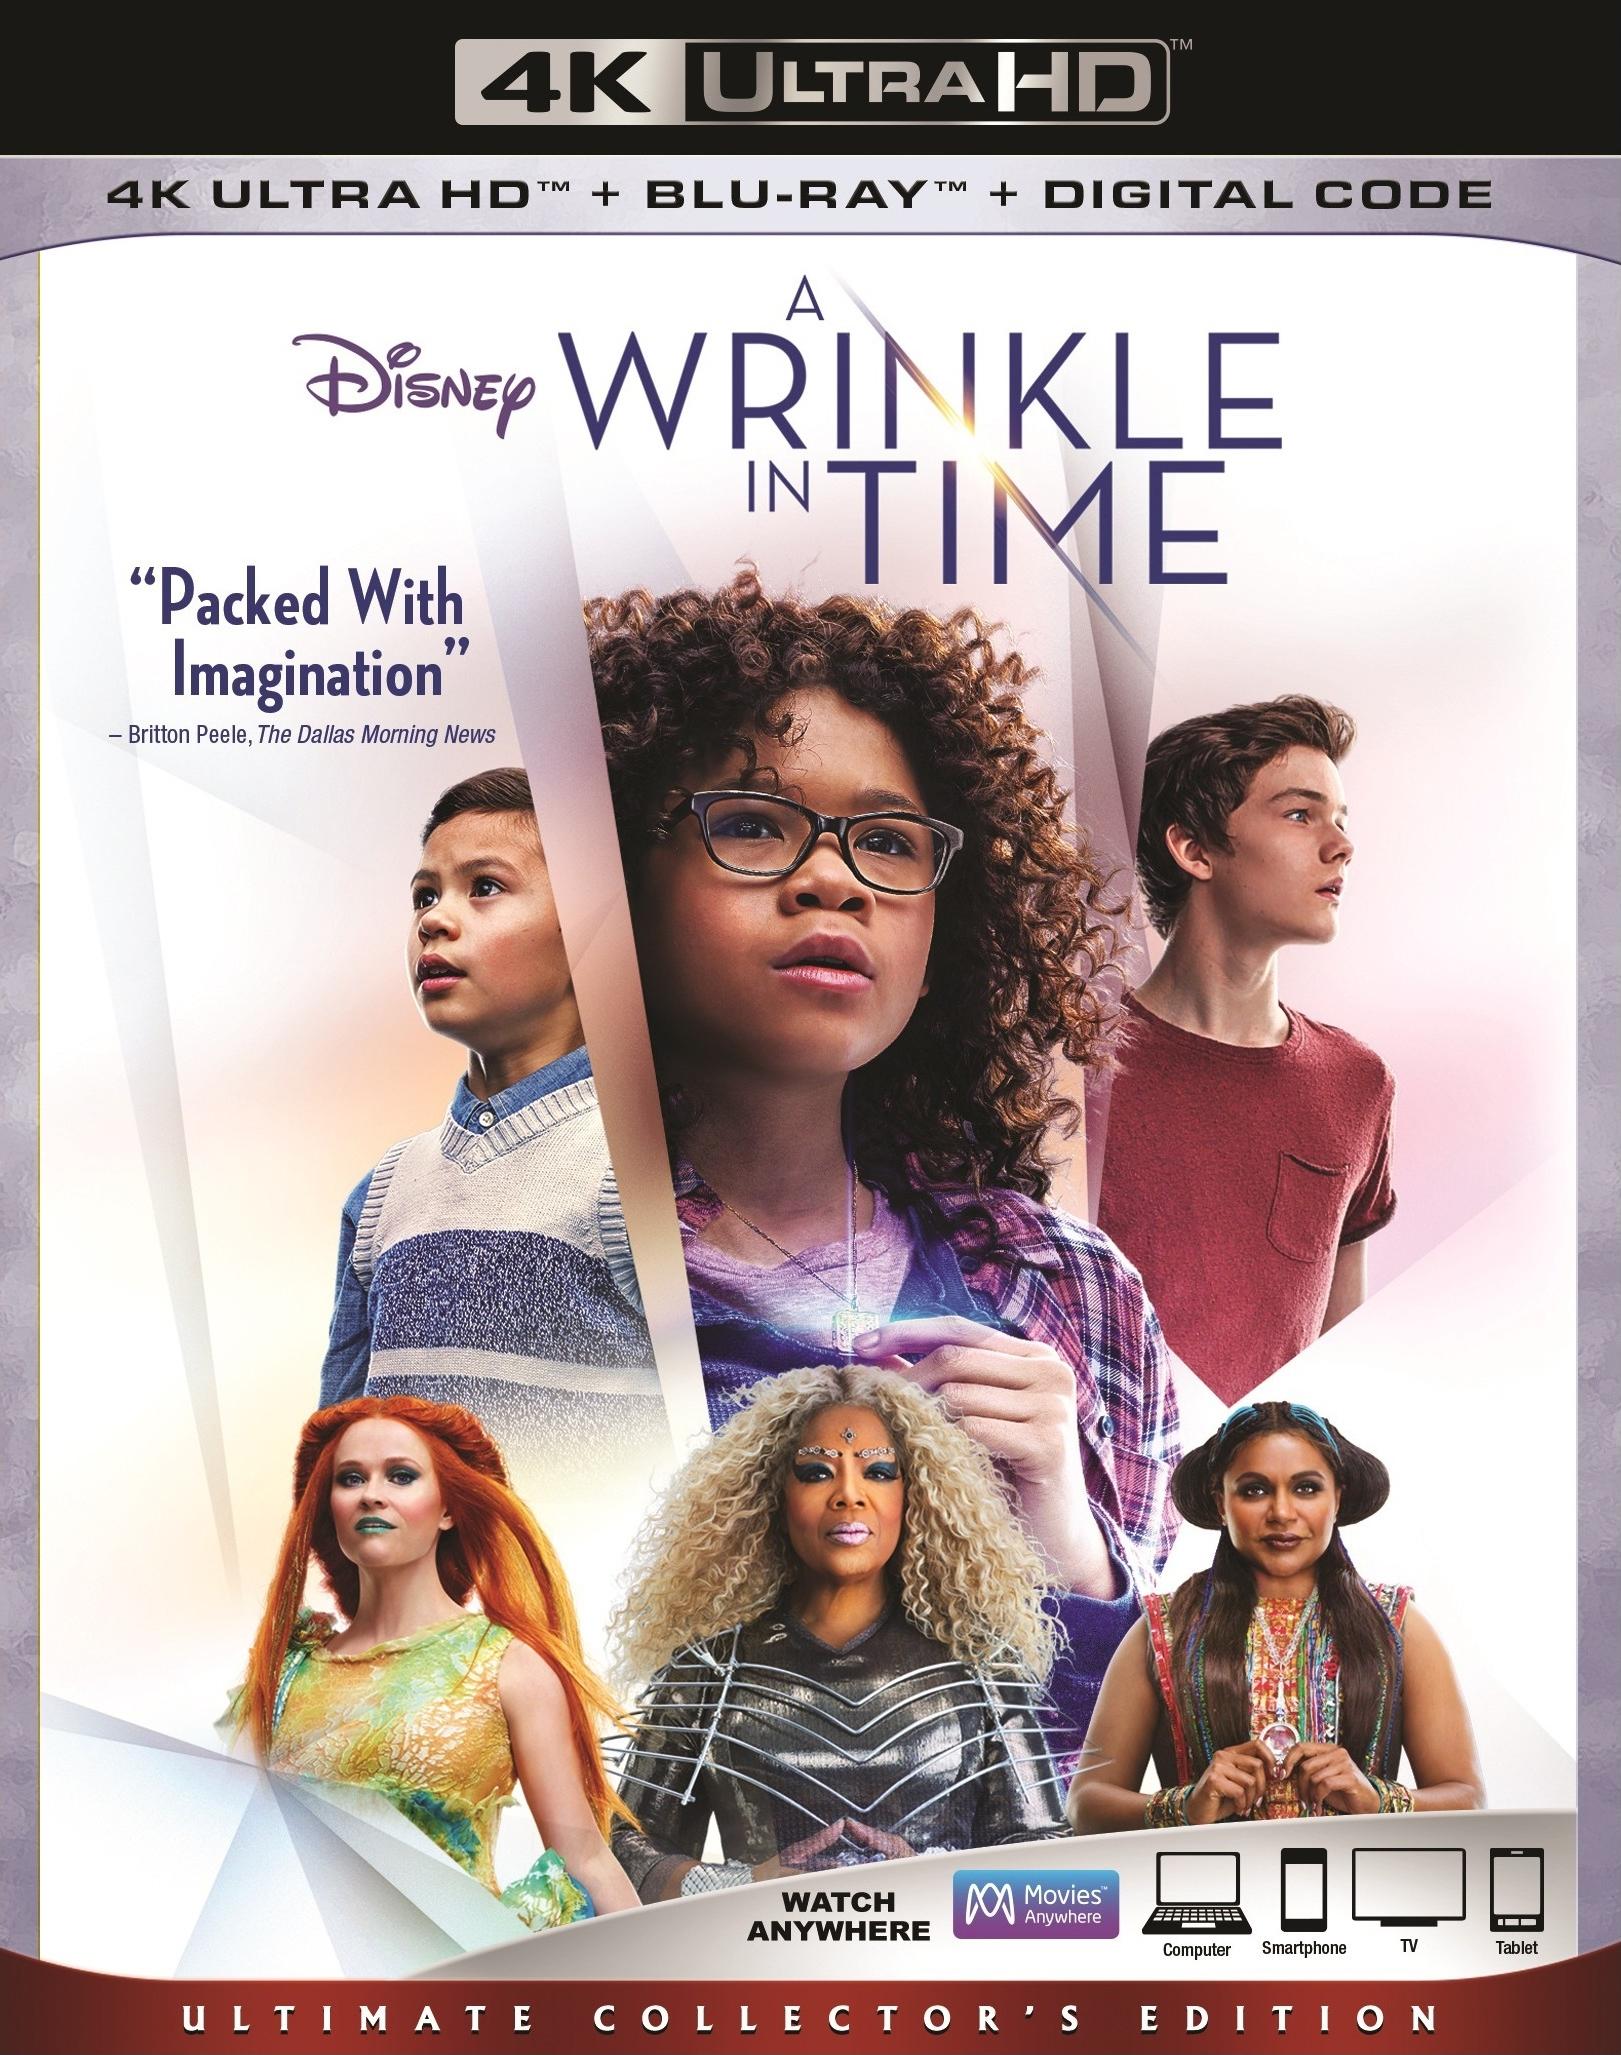 A Wrinkle in Time 4K (2018) Ultra HD Blu-ray